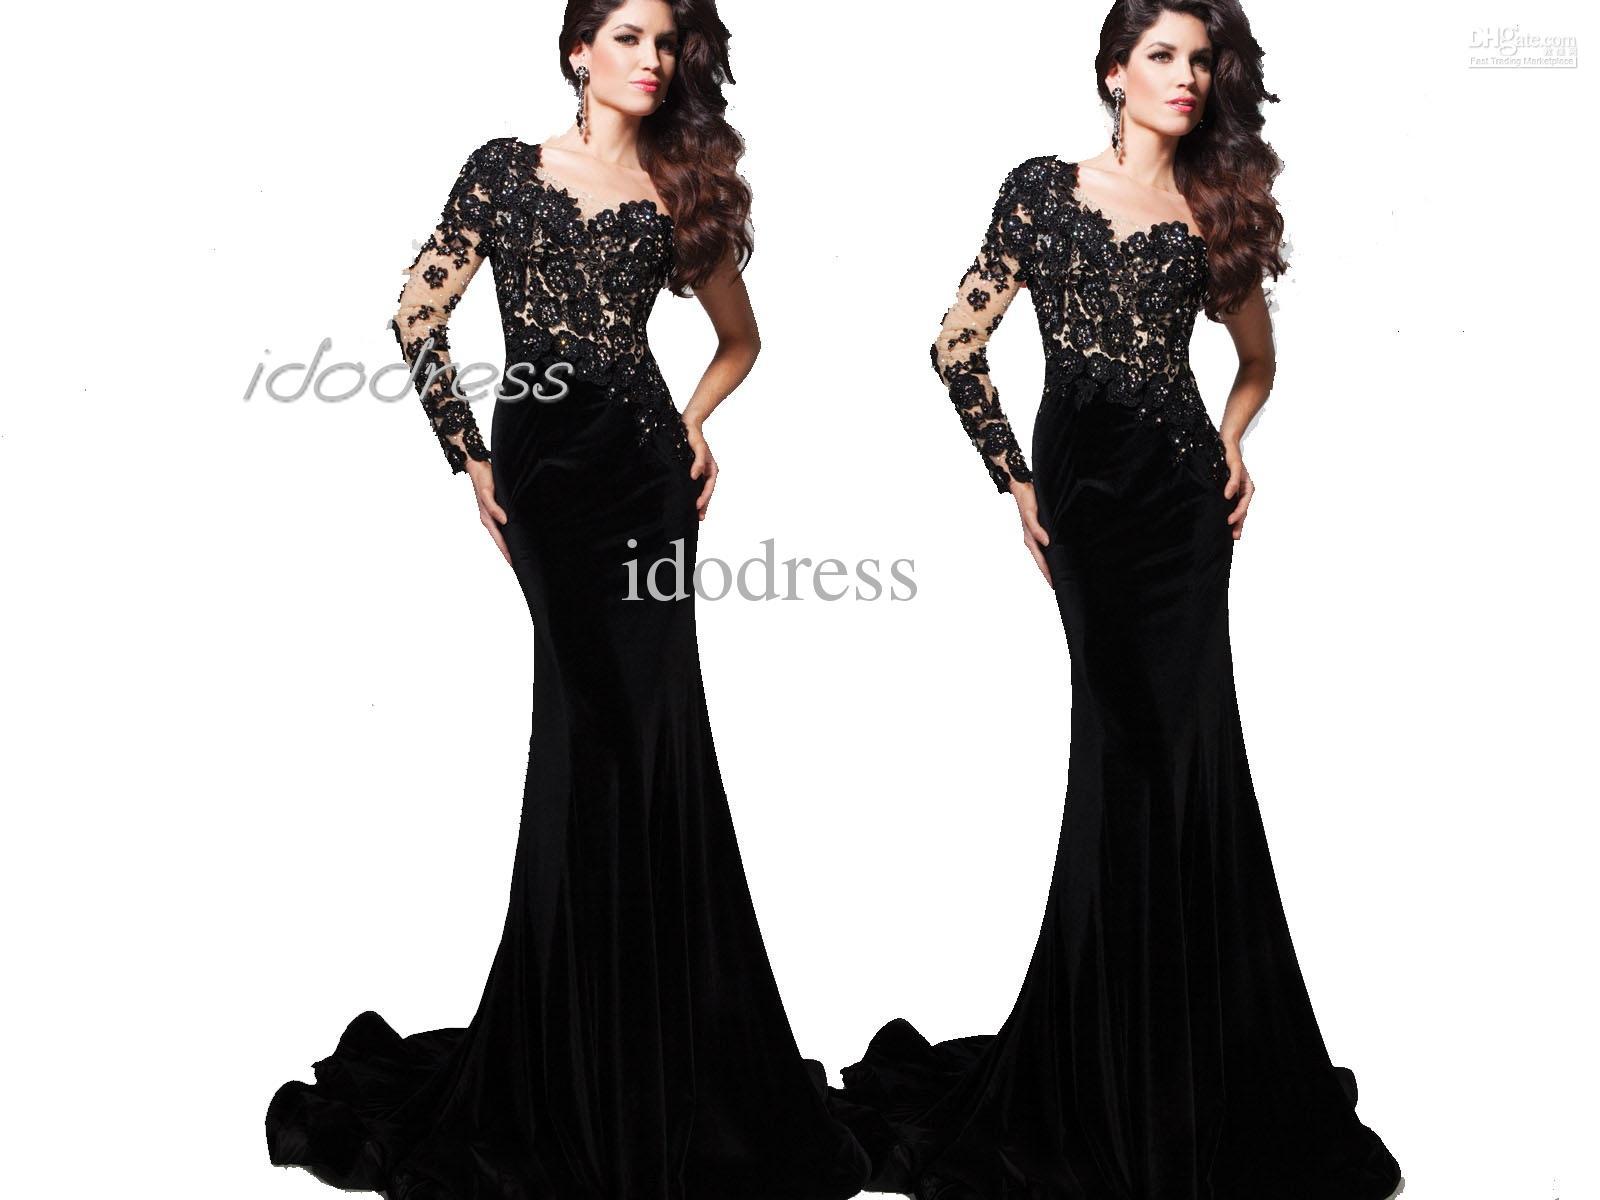 One Shoulder Black Lace Prom Dress 2013 New Fashion Sheath ... Lace Prom Dresses 2013